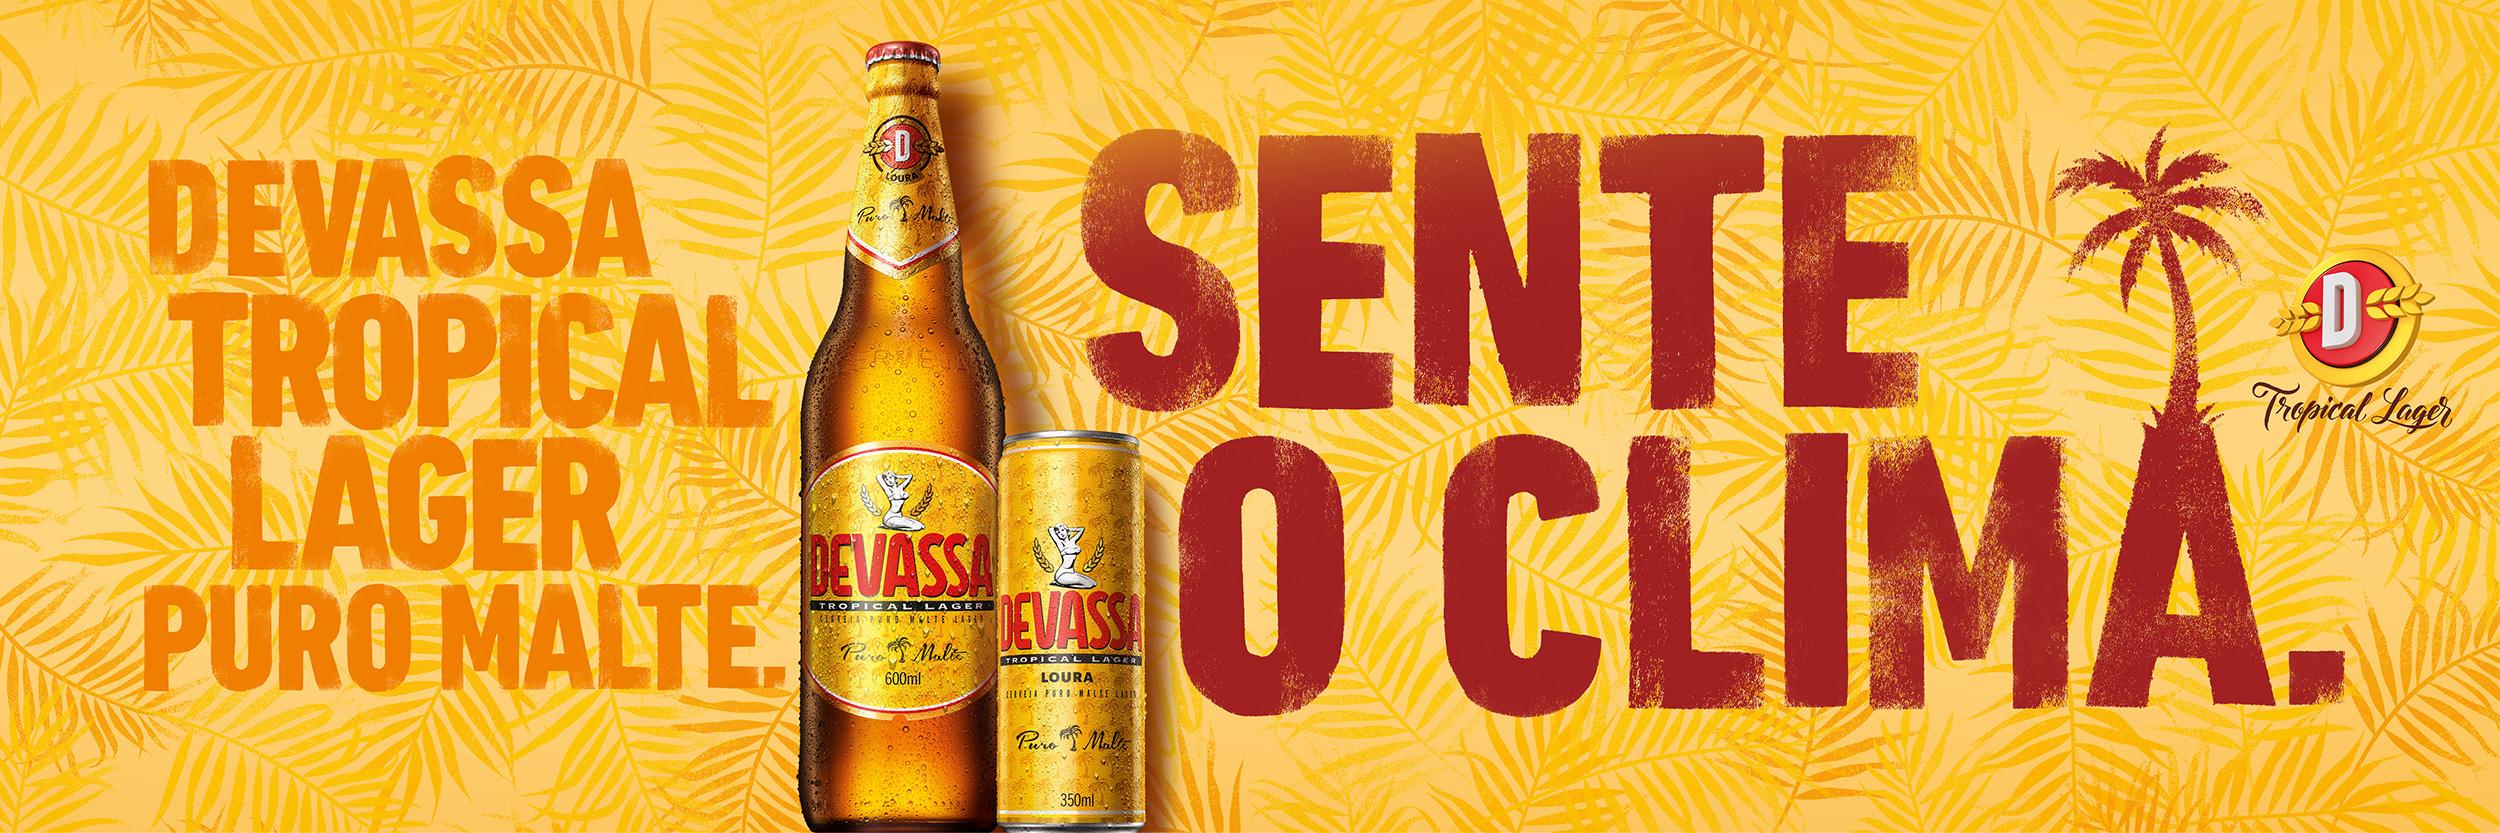 Copy:  Devassa tropical pure malt. Feels the sensation.